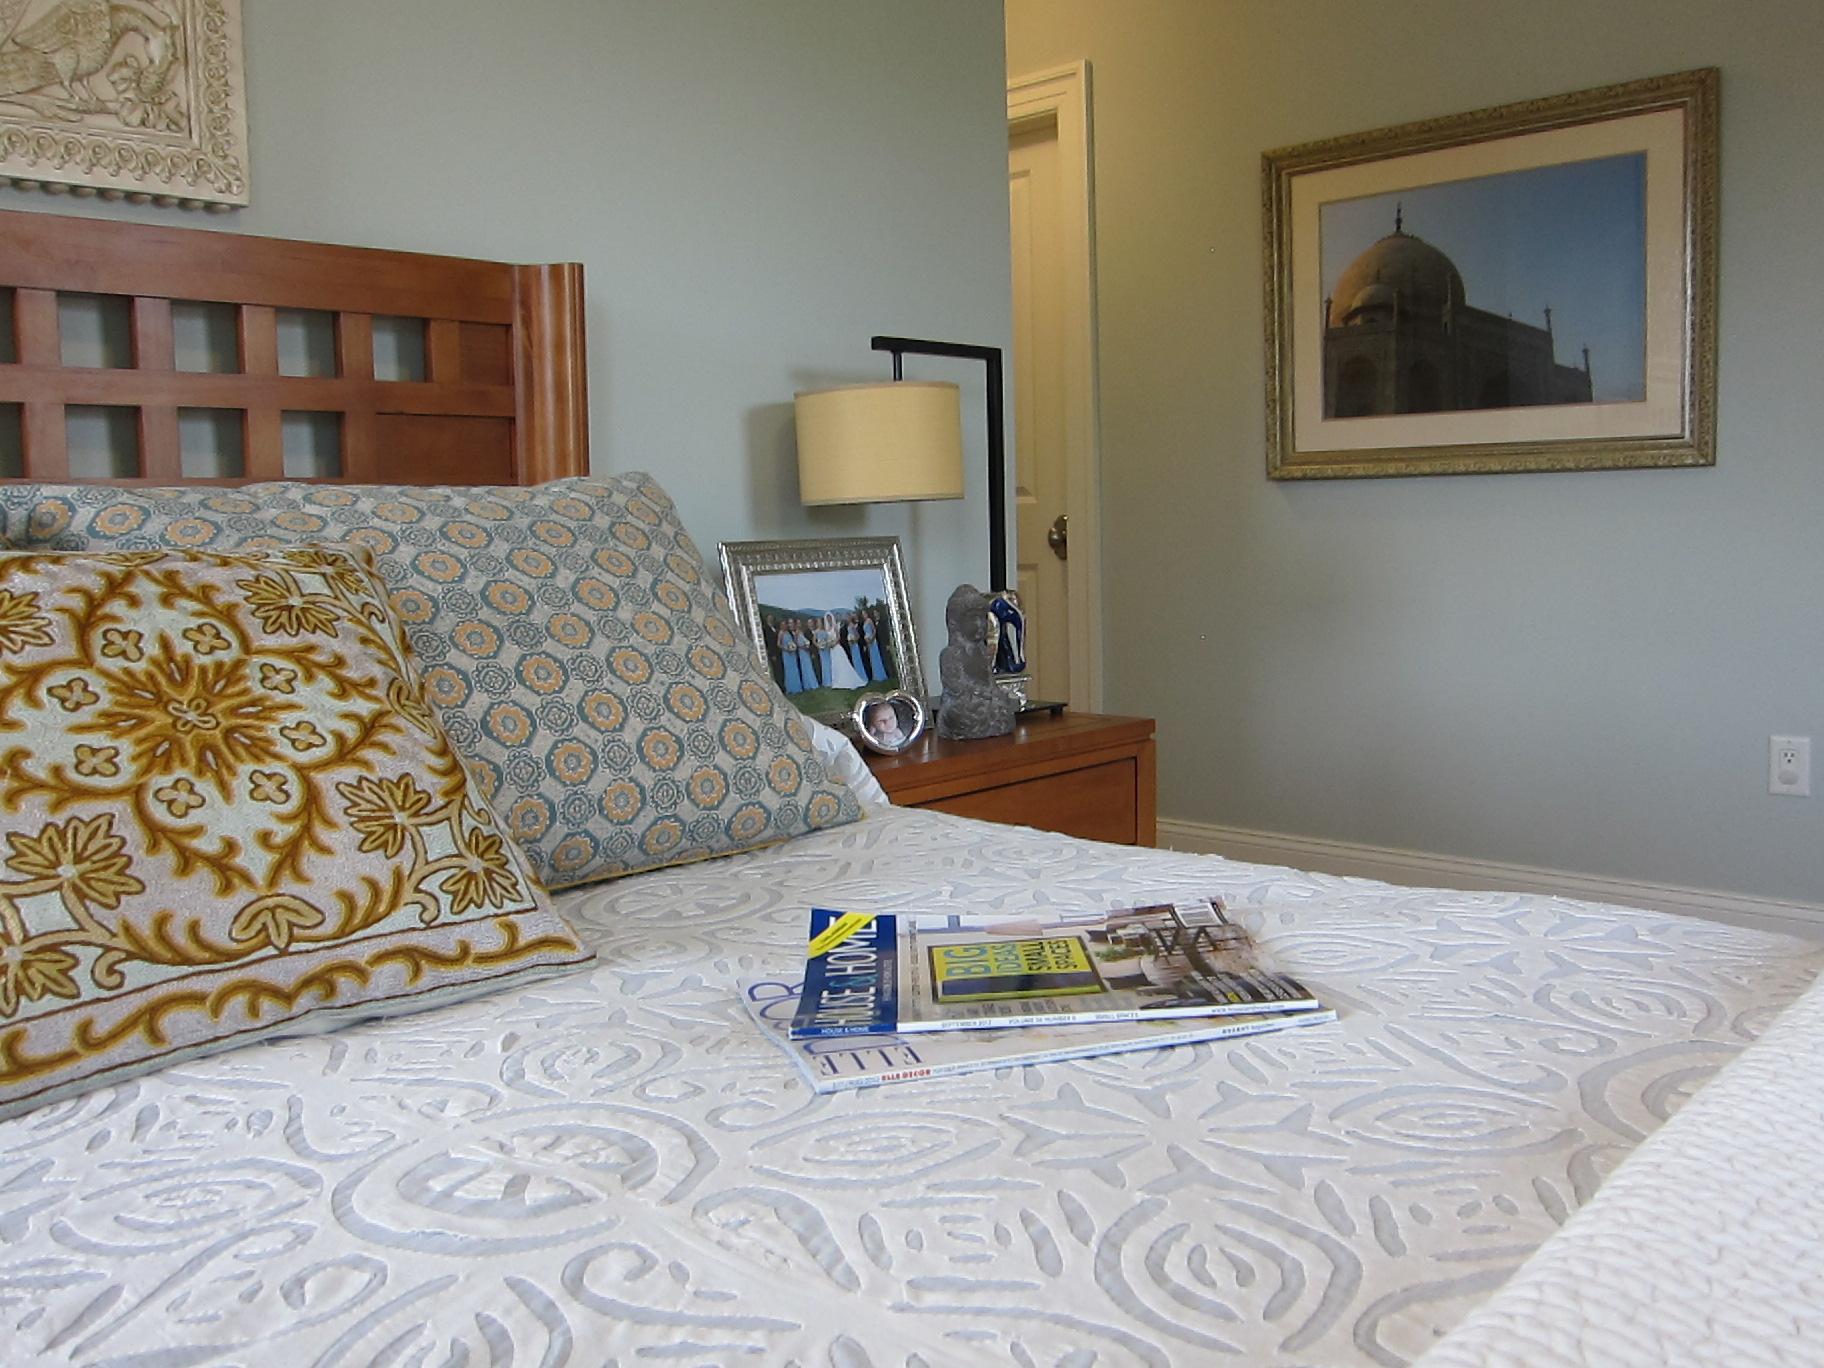 Master Bedroom - Taj Mahal Photograph